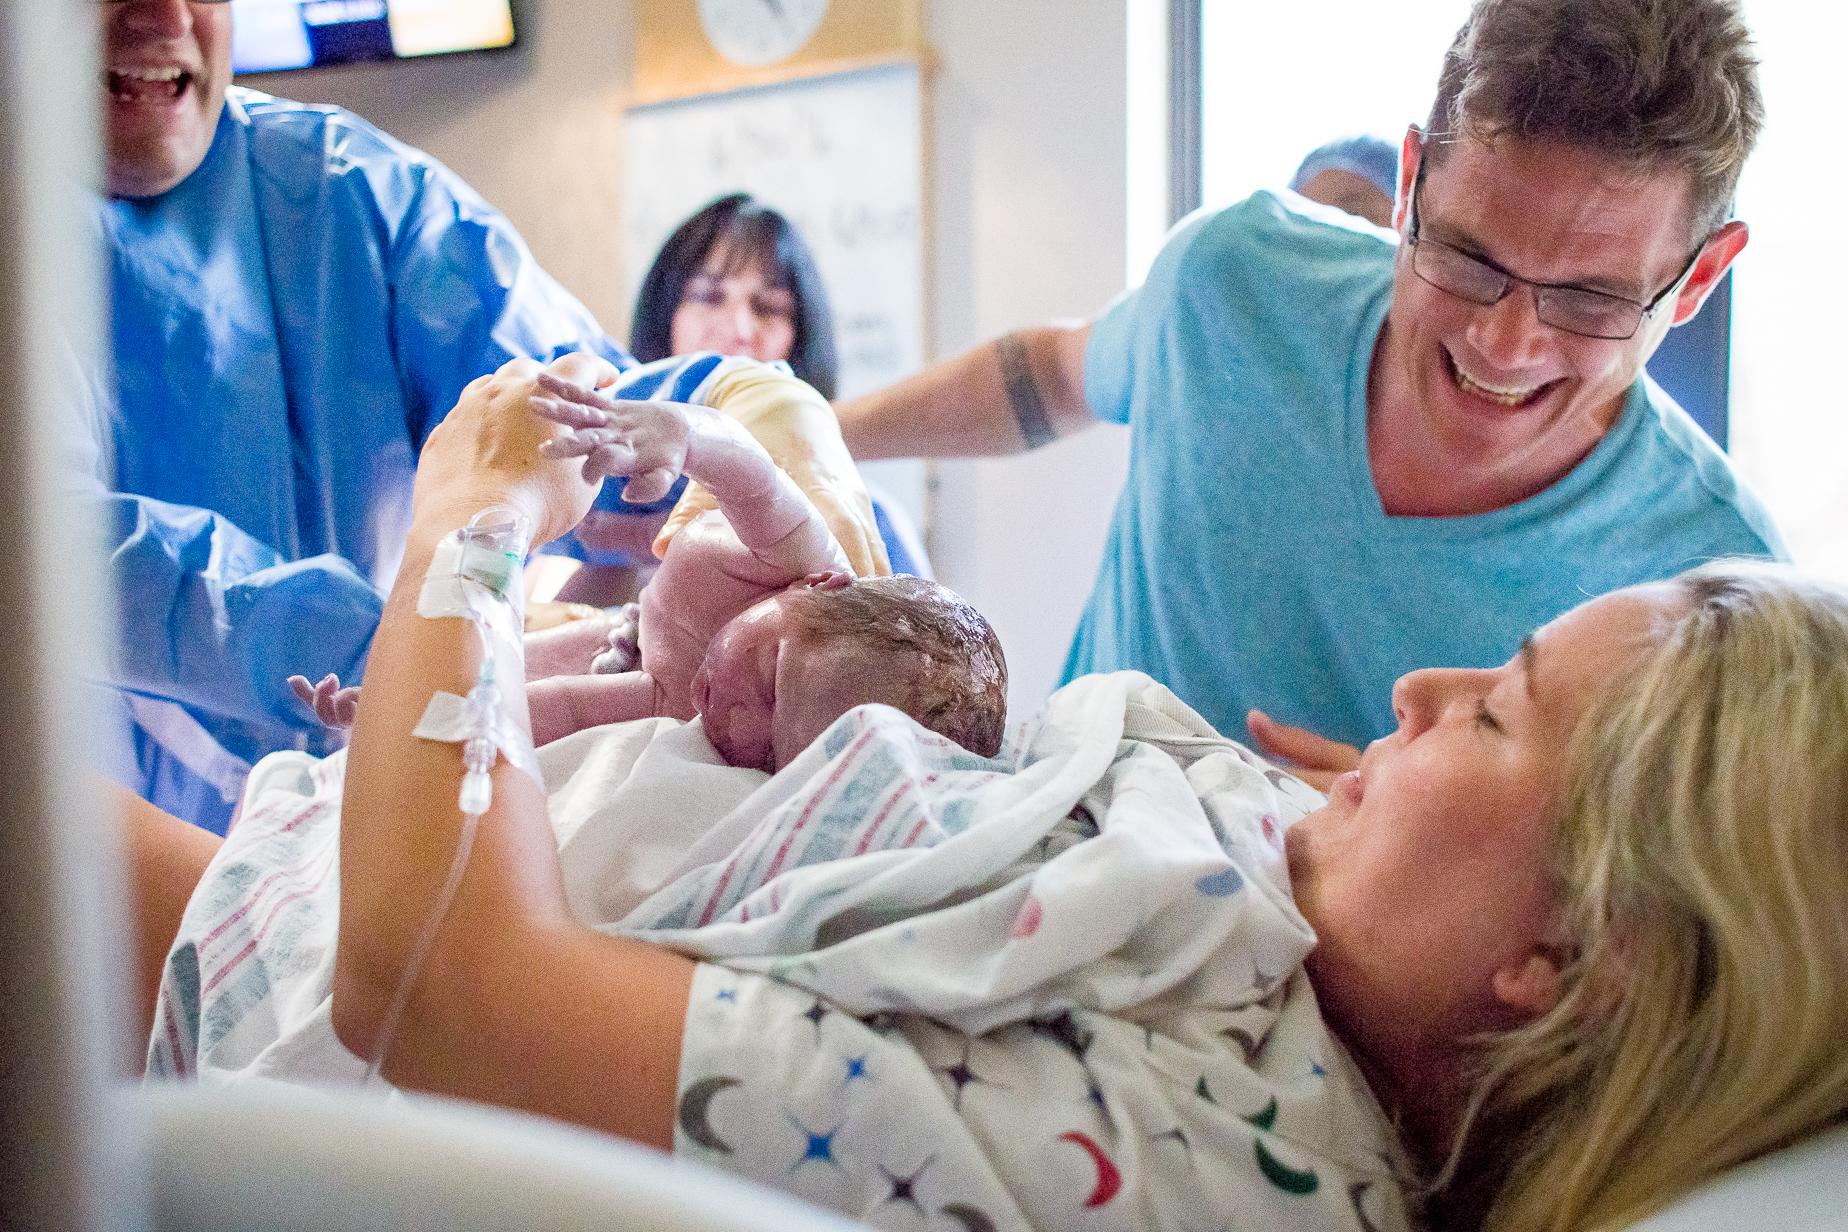 west-boca-hospital-gentle-c-section-epidural-vbac-home-birth-mary-harris-palms-birth-house-center-9.jpg